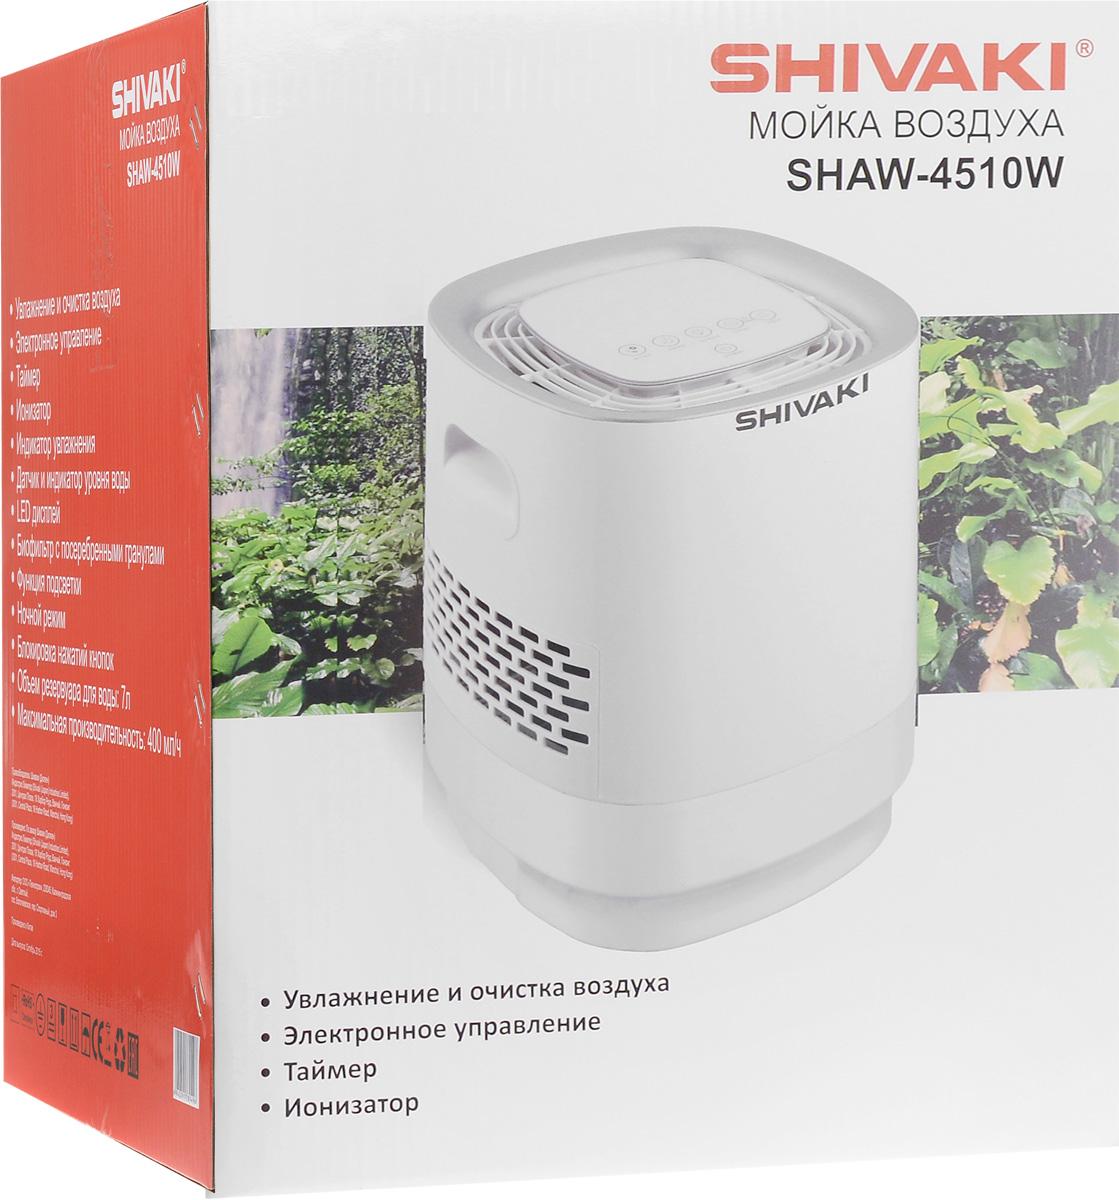 Shivaki SHAW-4510Wмойка воздуха Shivaki